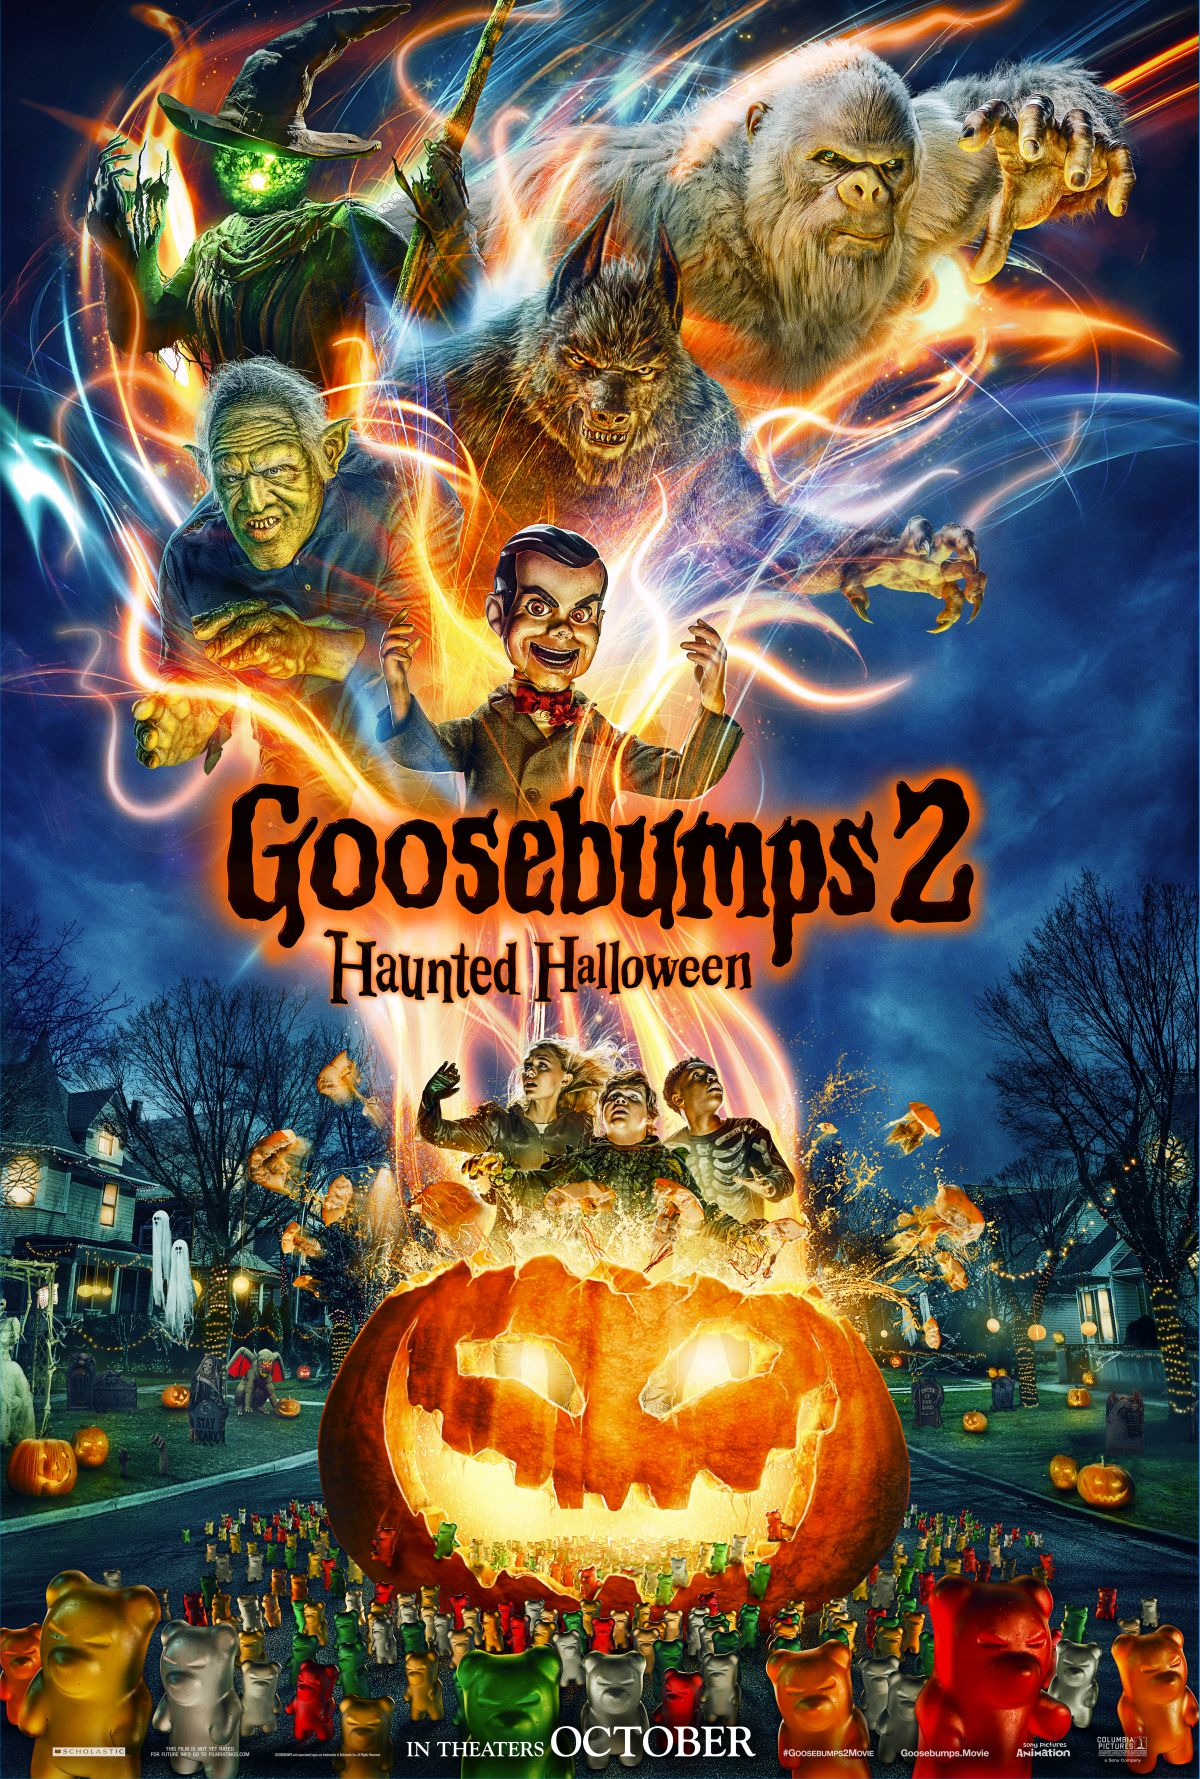 First Trailer For Goosebumps 2 Happy Halloween Reveals